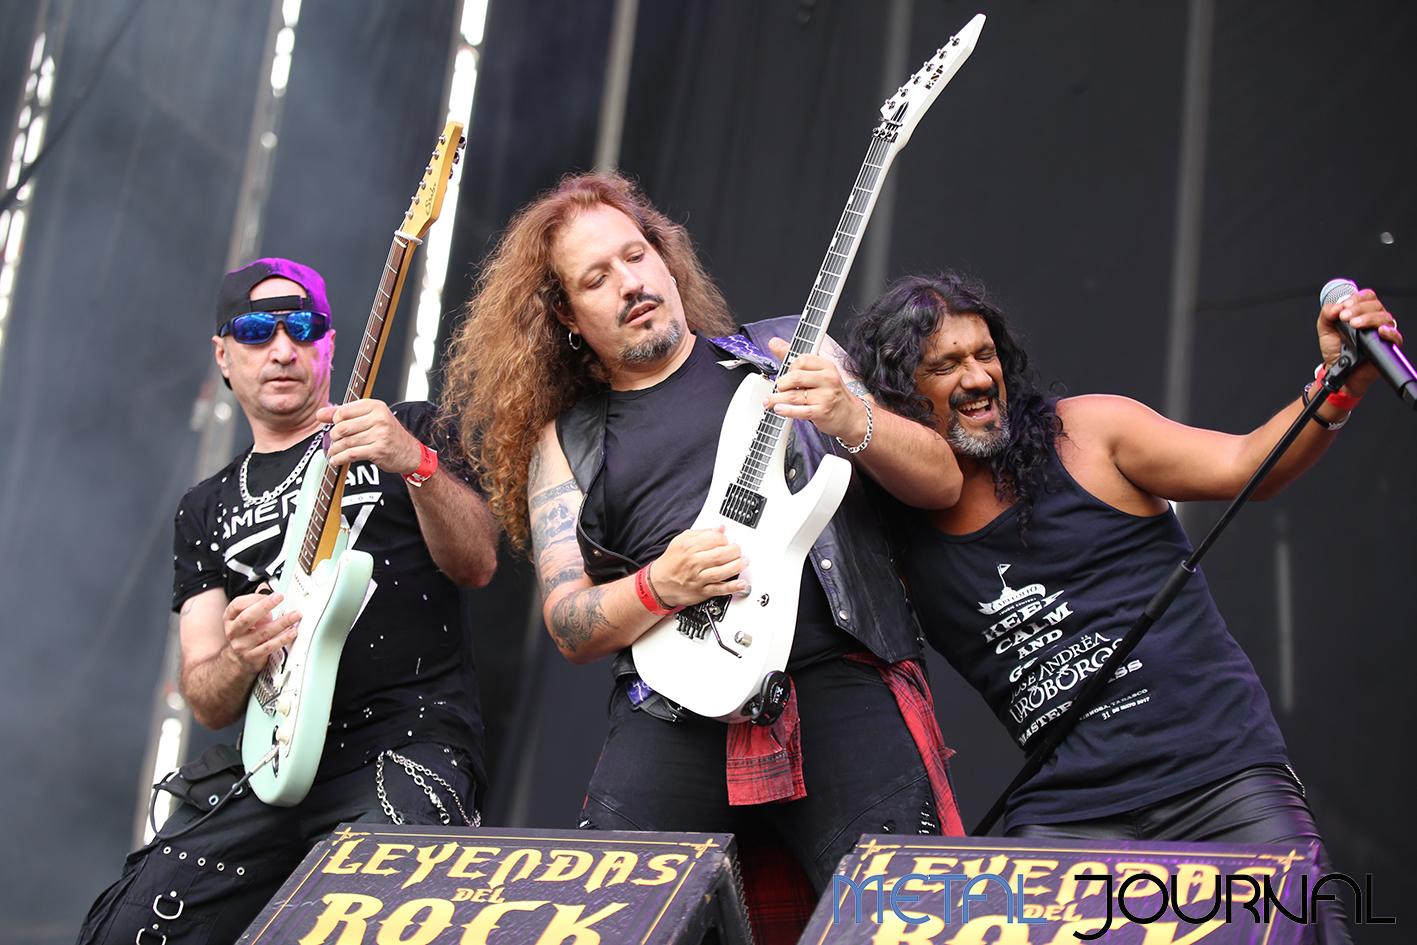 jose andrea uroboros - leyendas del rock 2019 metal journal pic 2